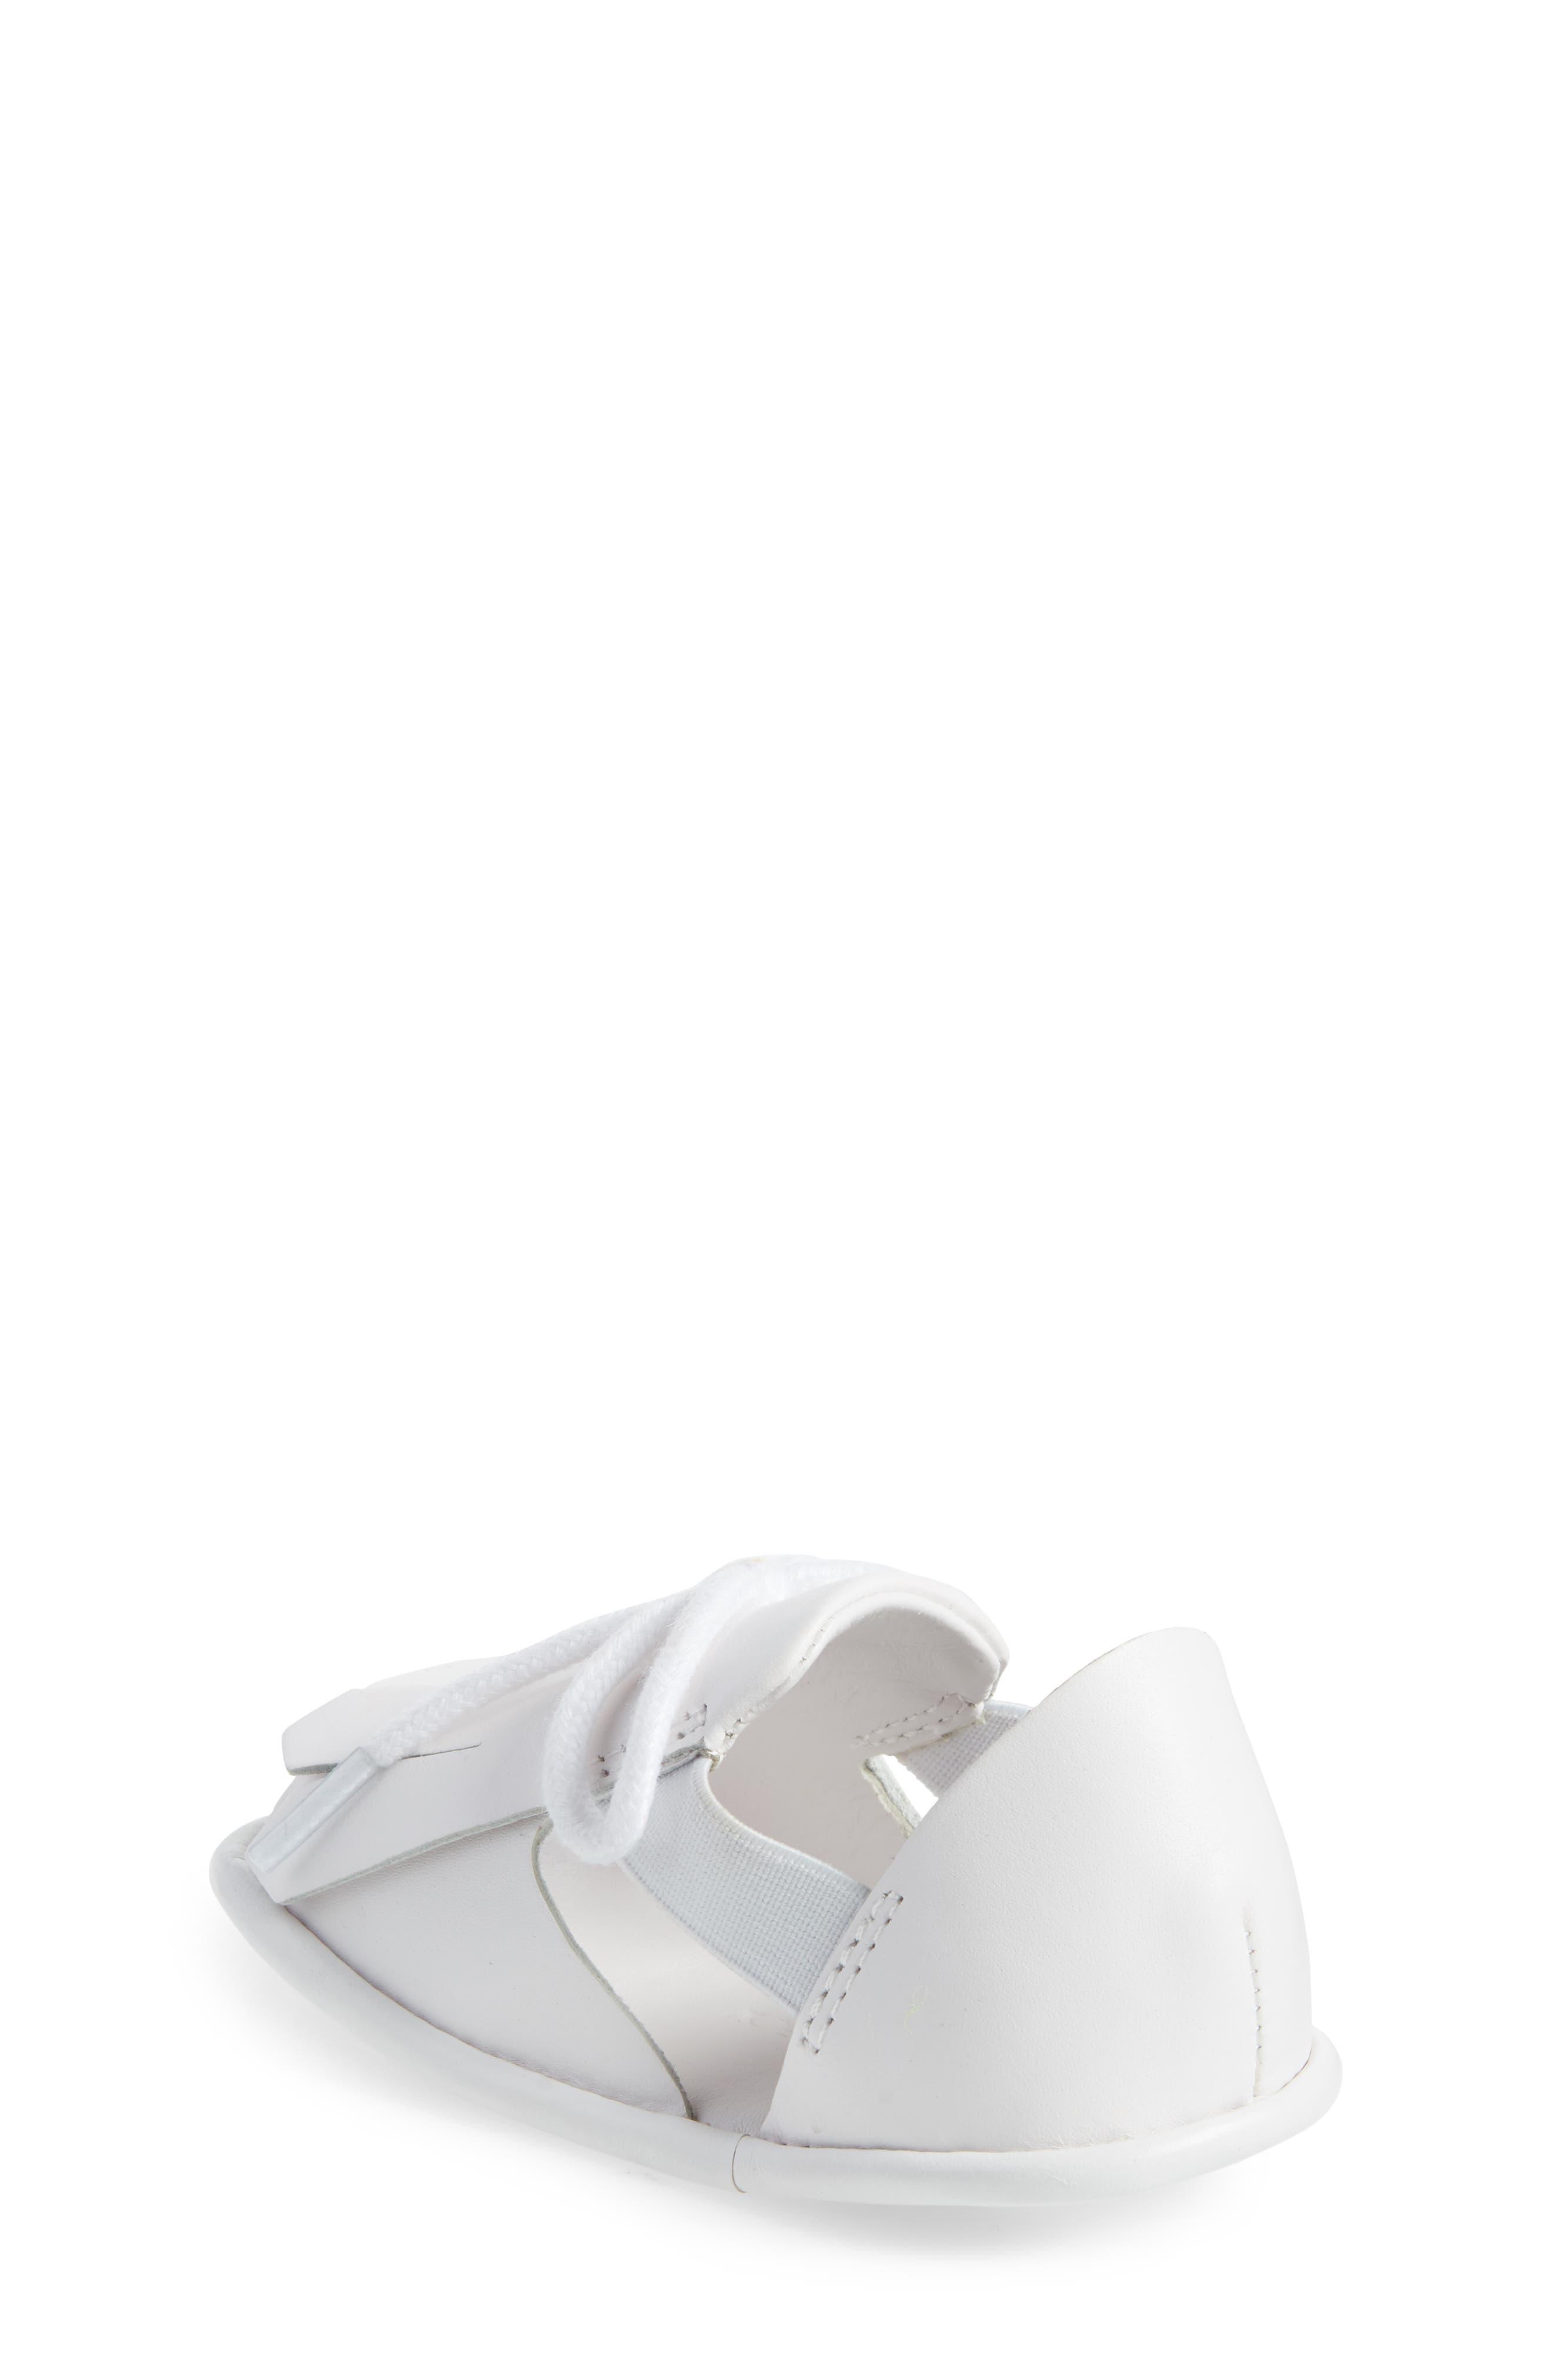 New Dawny Kiltie Fringe Crib Sandal,                             Alternate thumbnail 2, color,                             Optic White